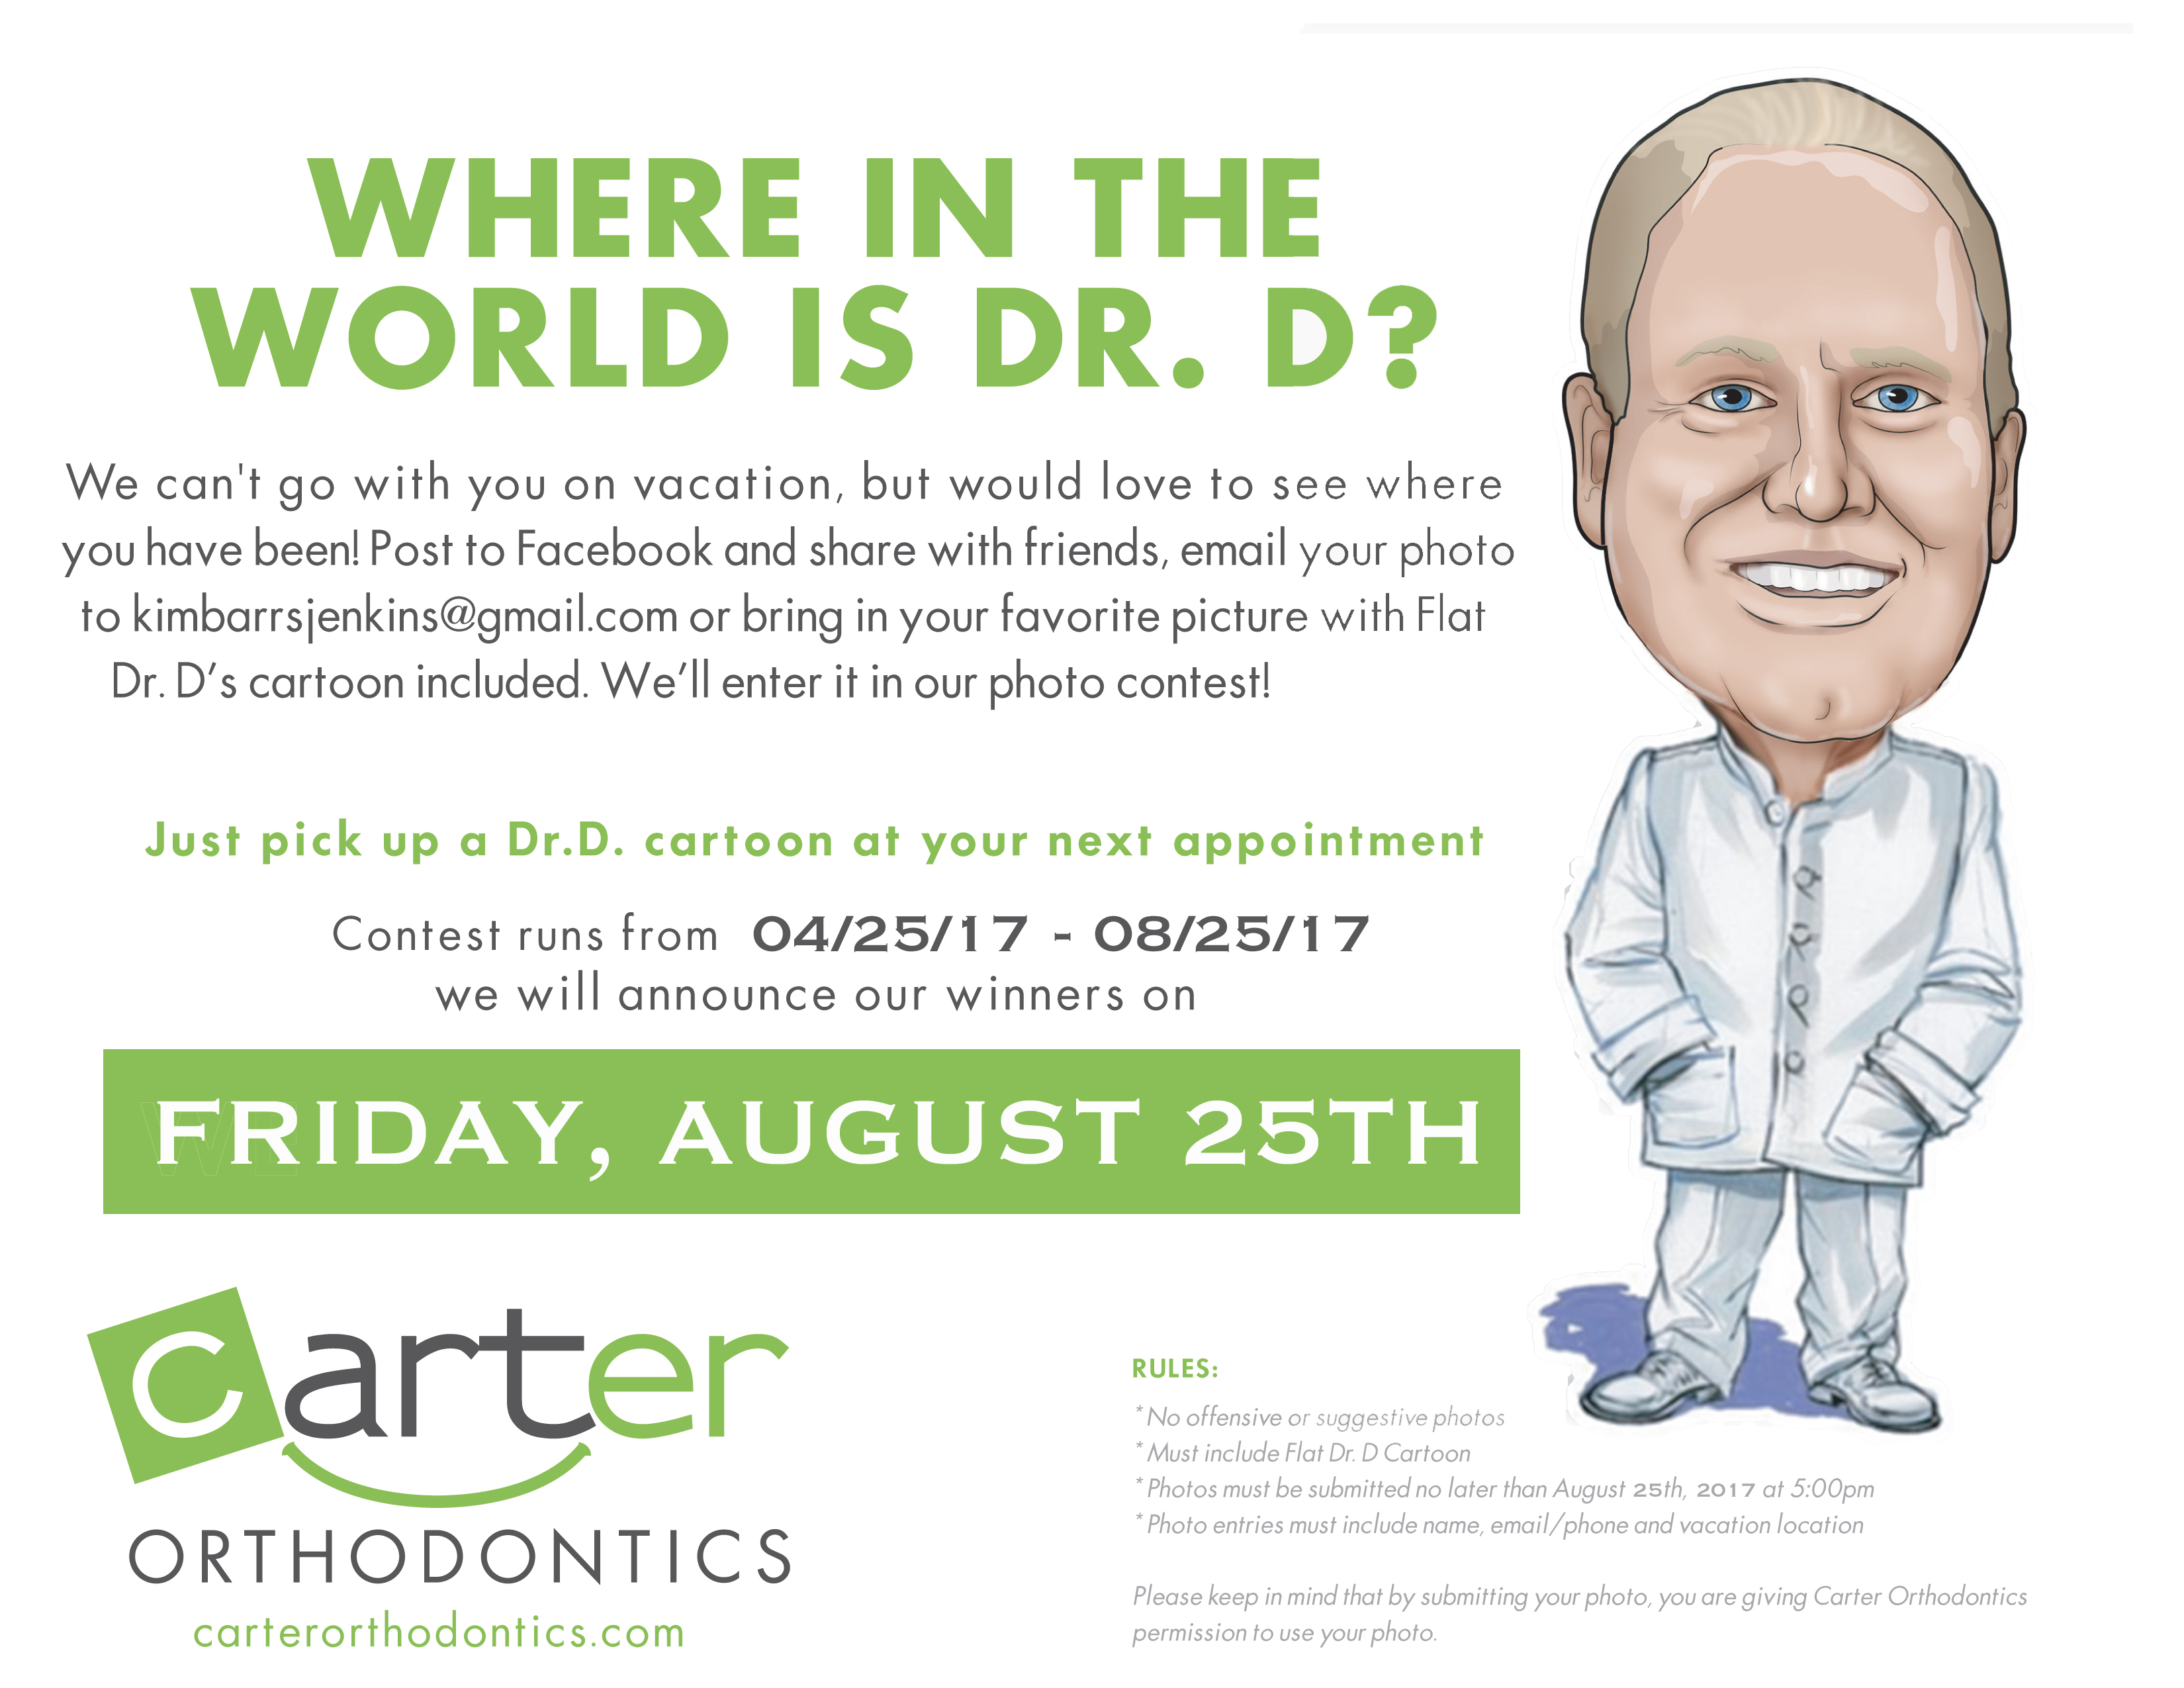 Flat Dr. David